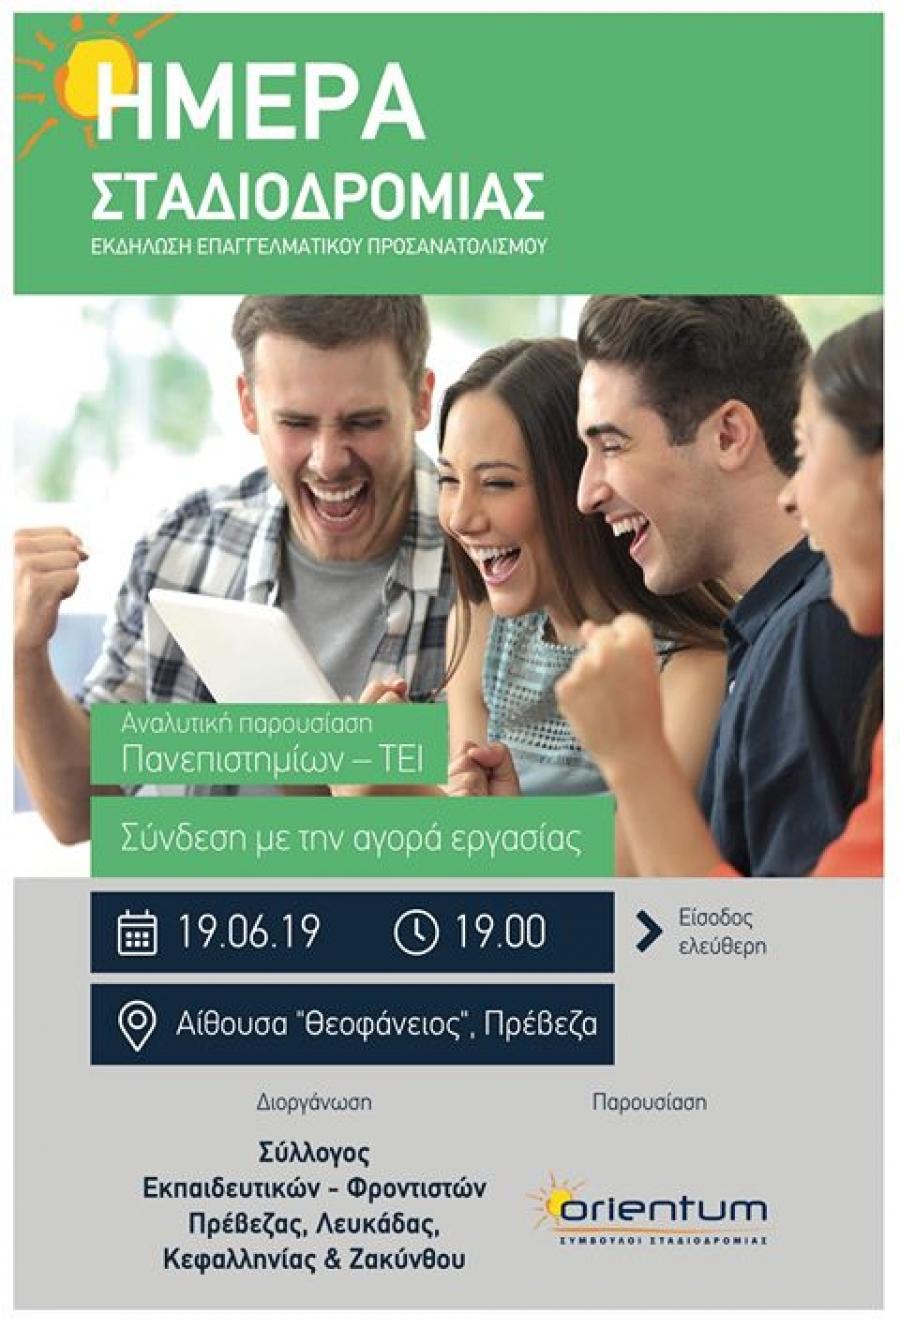 Aνοιχτή εκδήλωση Επαγγελματικού Προσανατολισμού στην Πρέβεζα στις 19 Ιουνίου